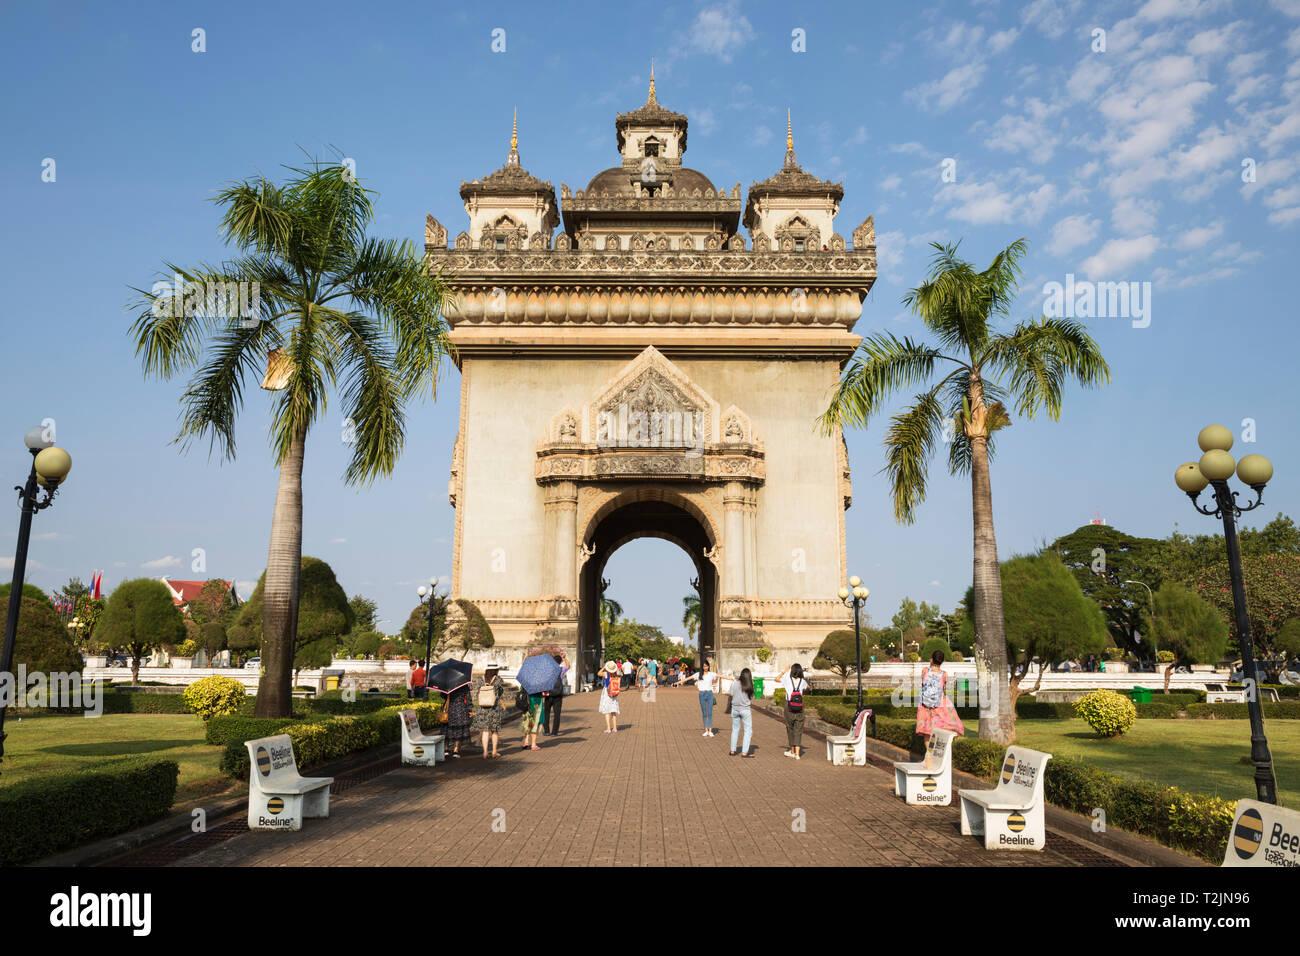 Patuxai Monumento a la victoria (Arc de Triomphe) de Vientiane, Vientiane, Laos, Sudeste de Asia Foto de stock